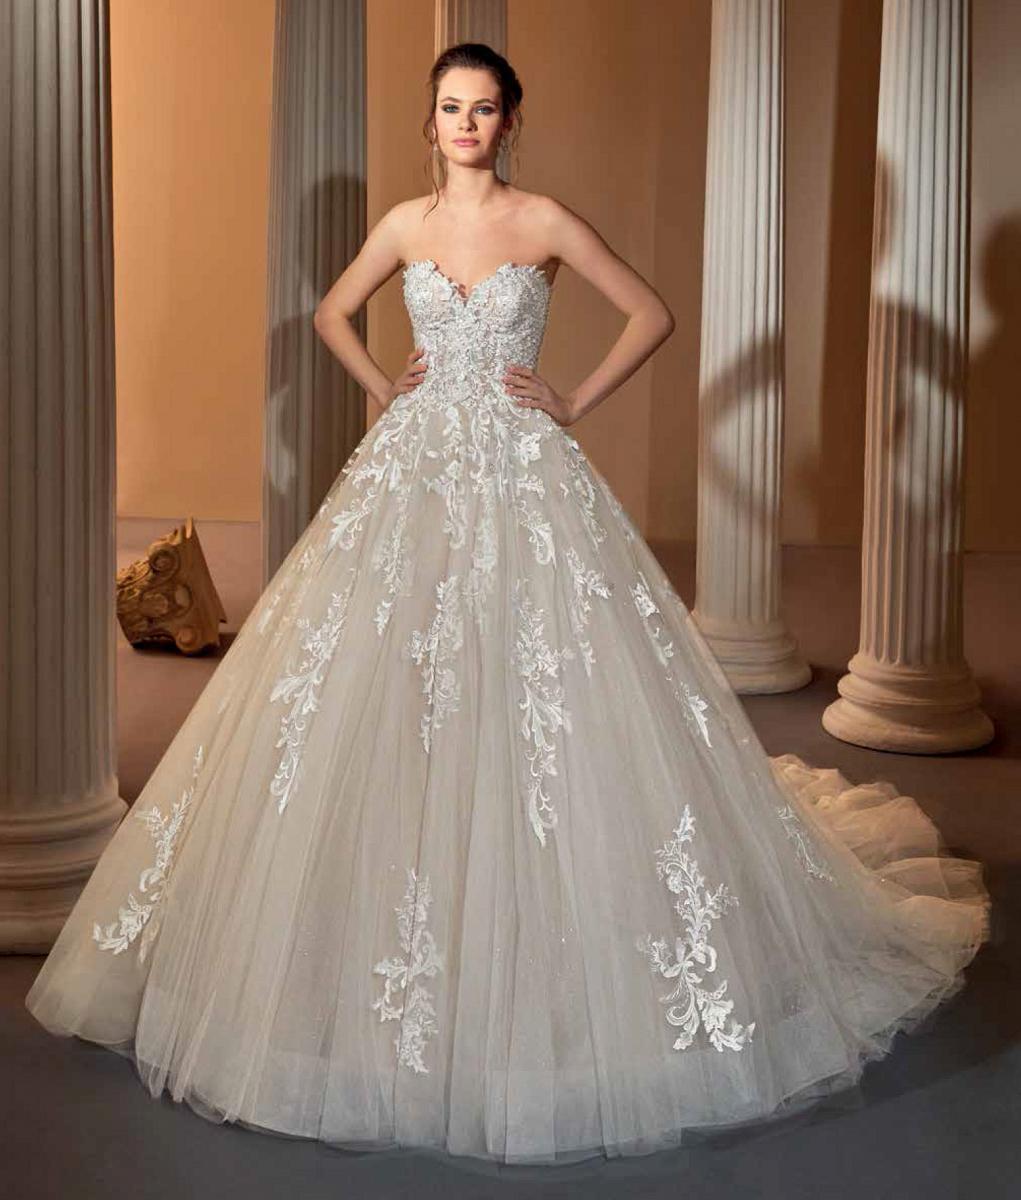 celli-spose-sposa-2022_DEMETRIOS-SPIRAL-1151-01